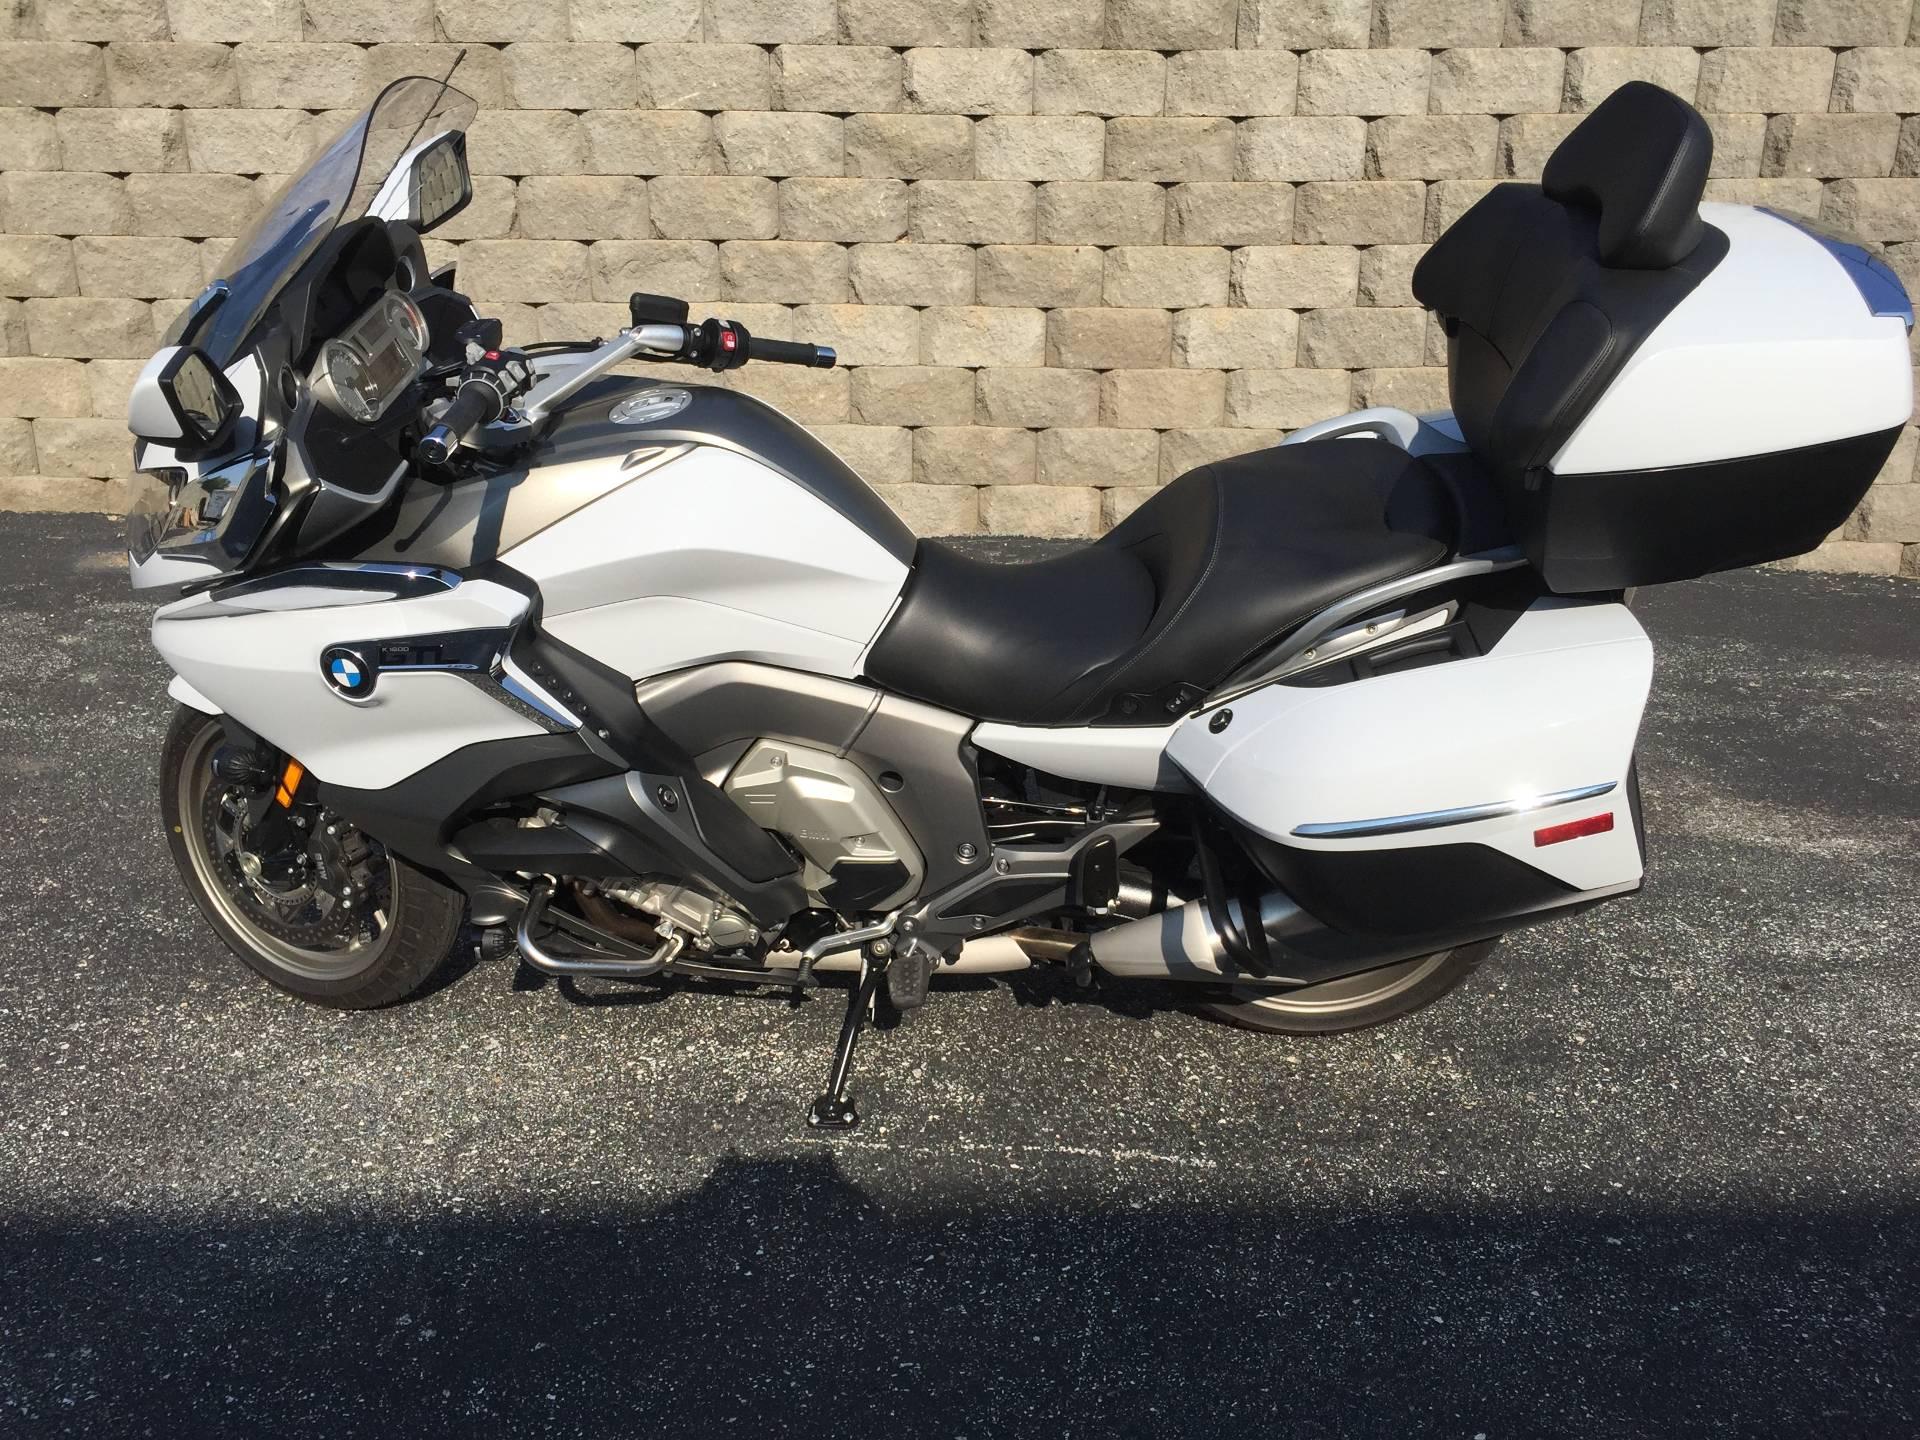 used 2018 bmw k 1600 gtl motorcycles in omaha, ne